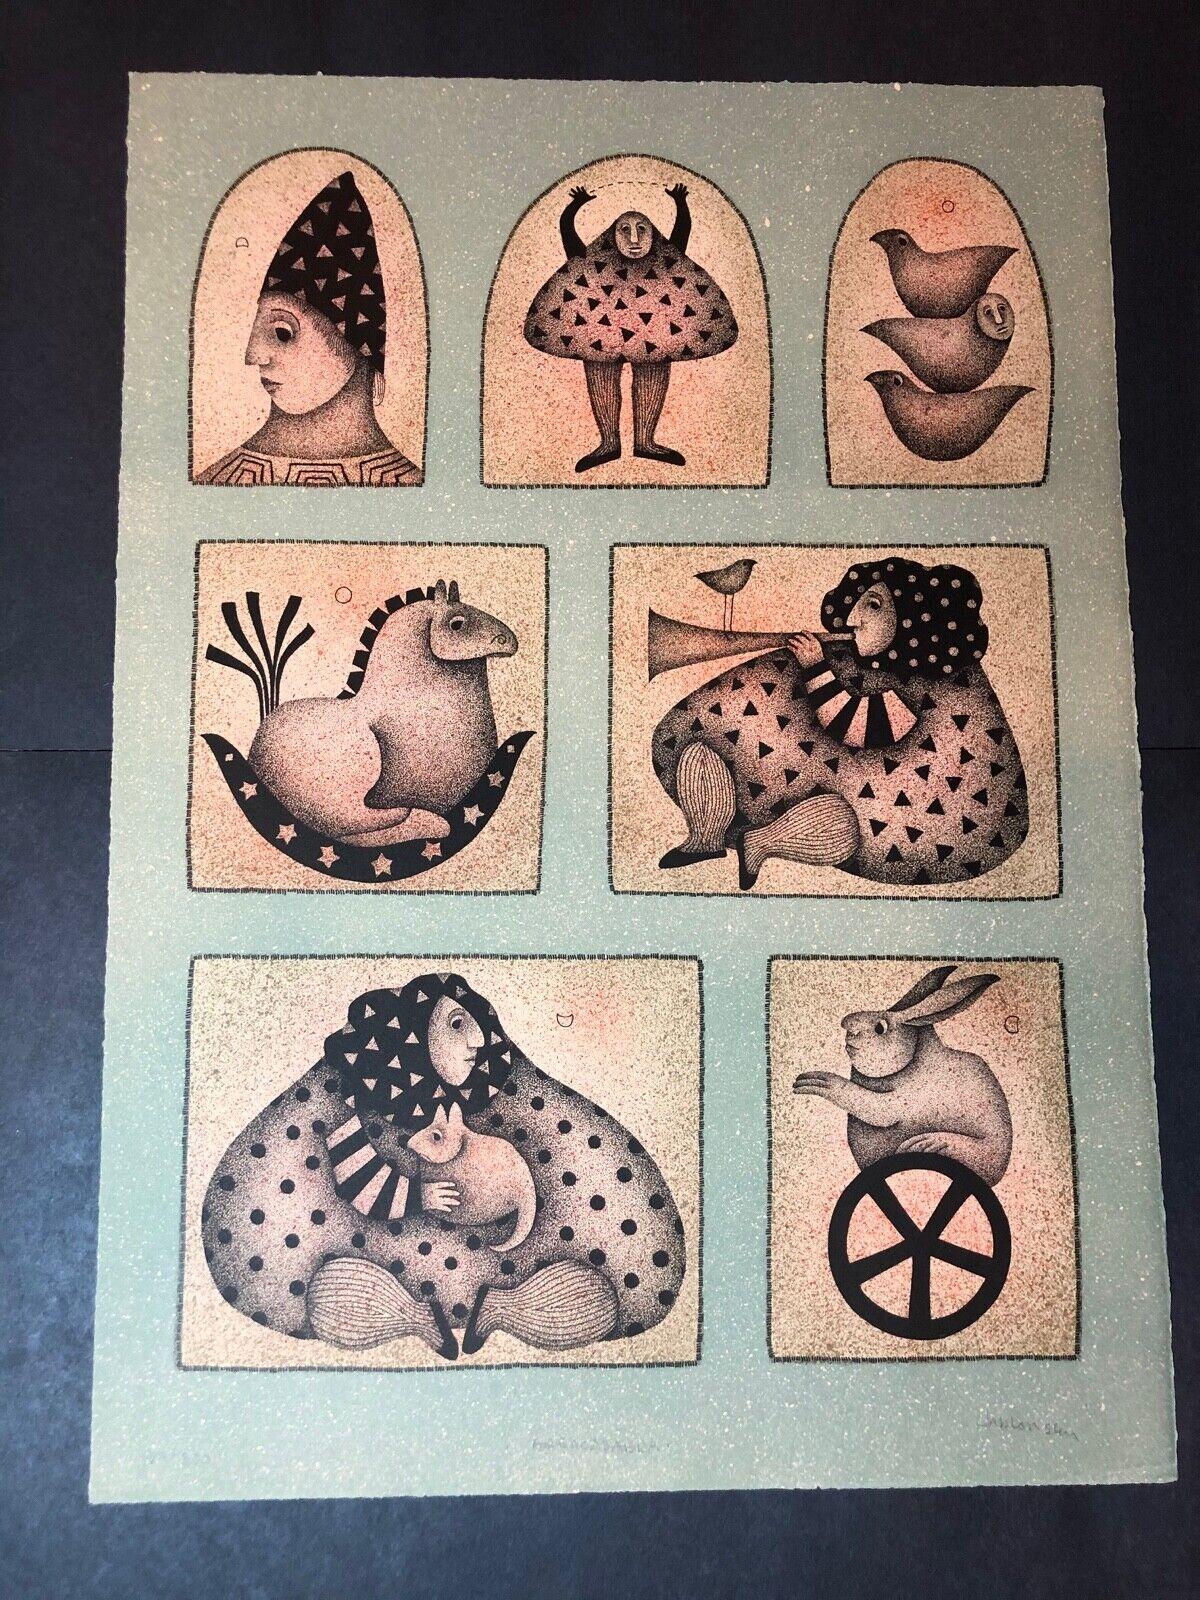 Carol Jablonsky Lithograph Art Print – Abracadabra Limited Edition 187/300 Art